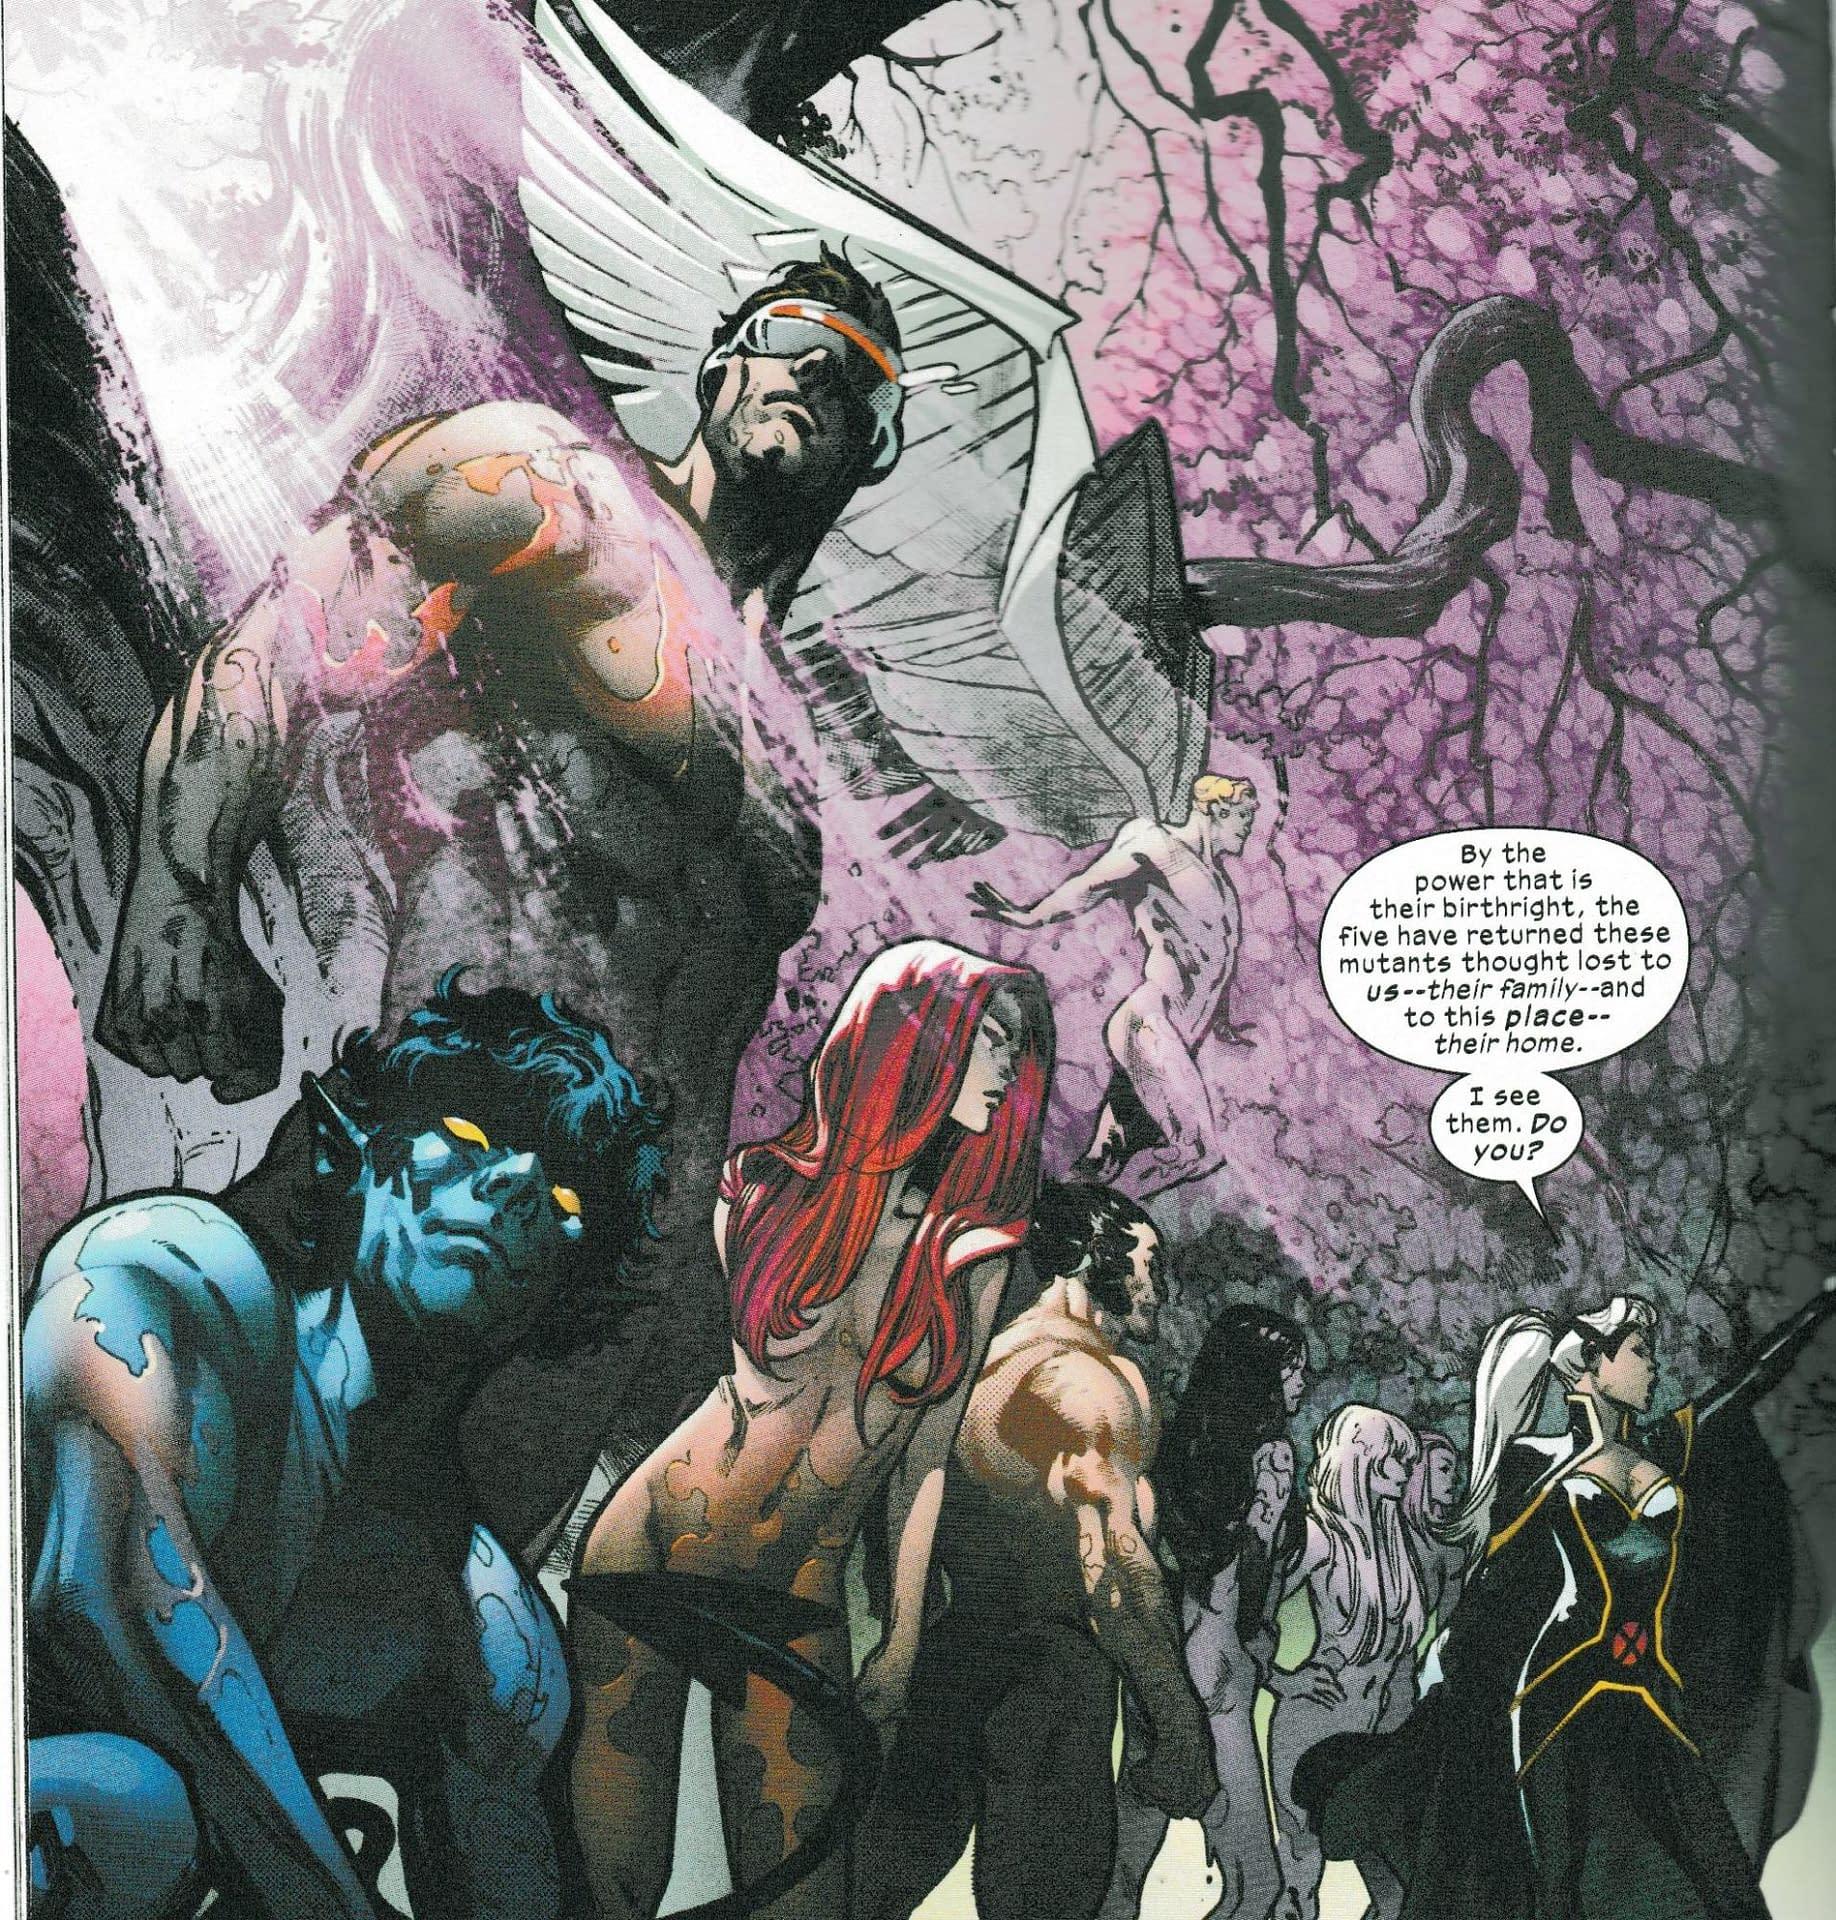 The State of Krakoan Nudity in X-Men #3, Excalibur #3 and Marauders #3 Today (Spoilers)